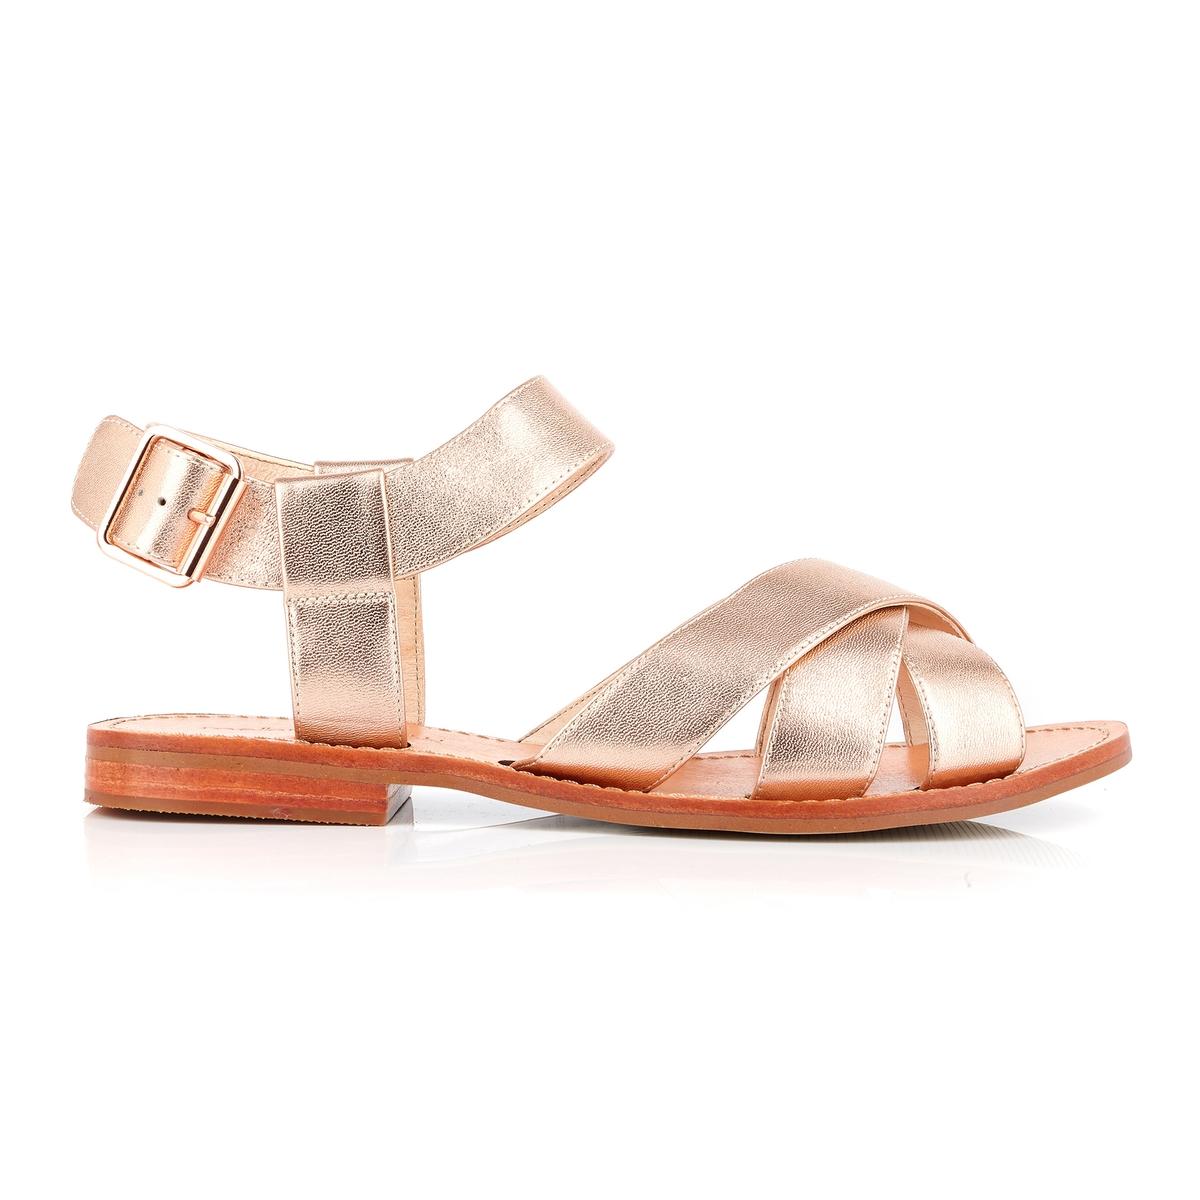 Босоножки кожаные на плоском каблуке Daline босоножки кожаные на плоском каблуке